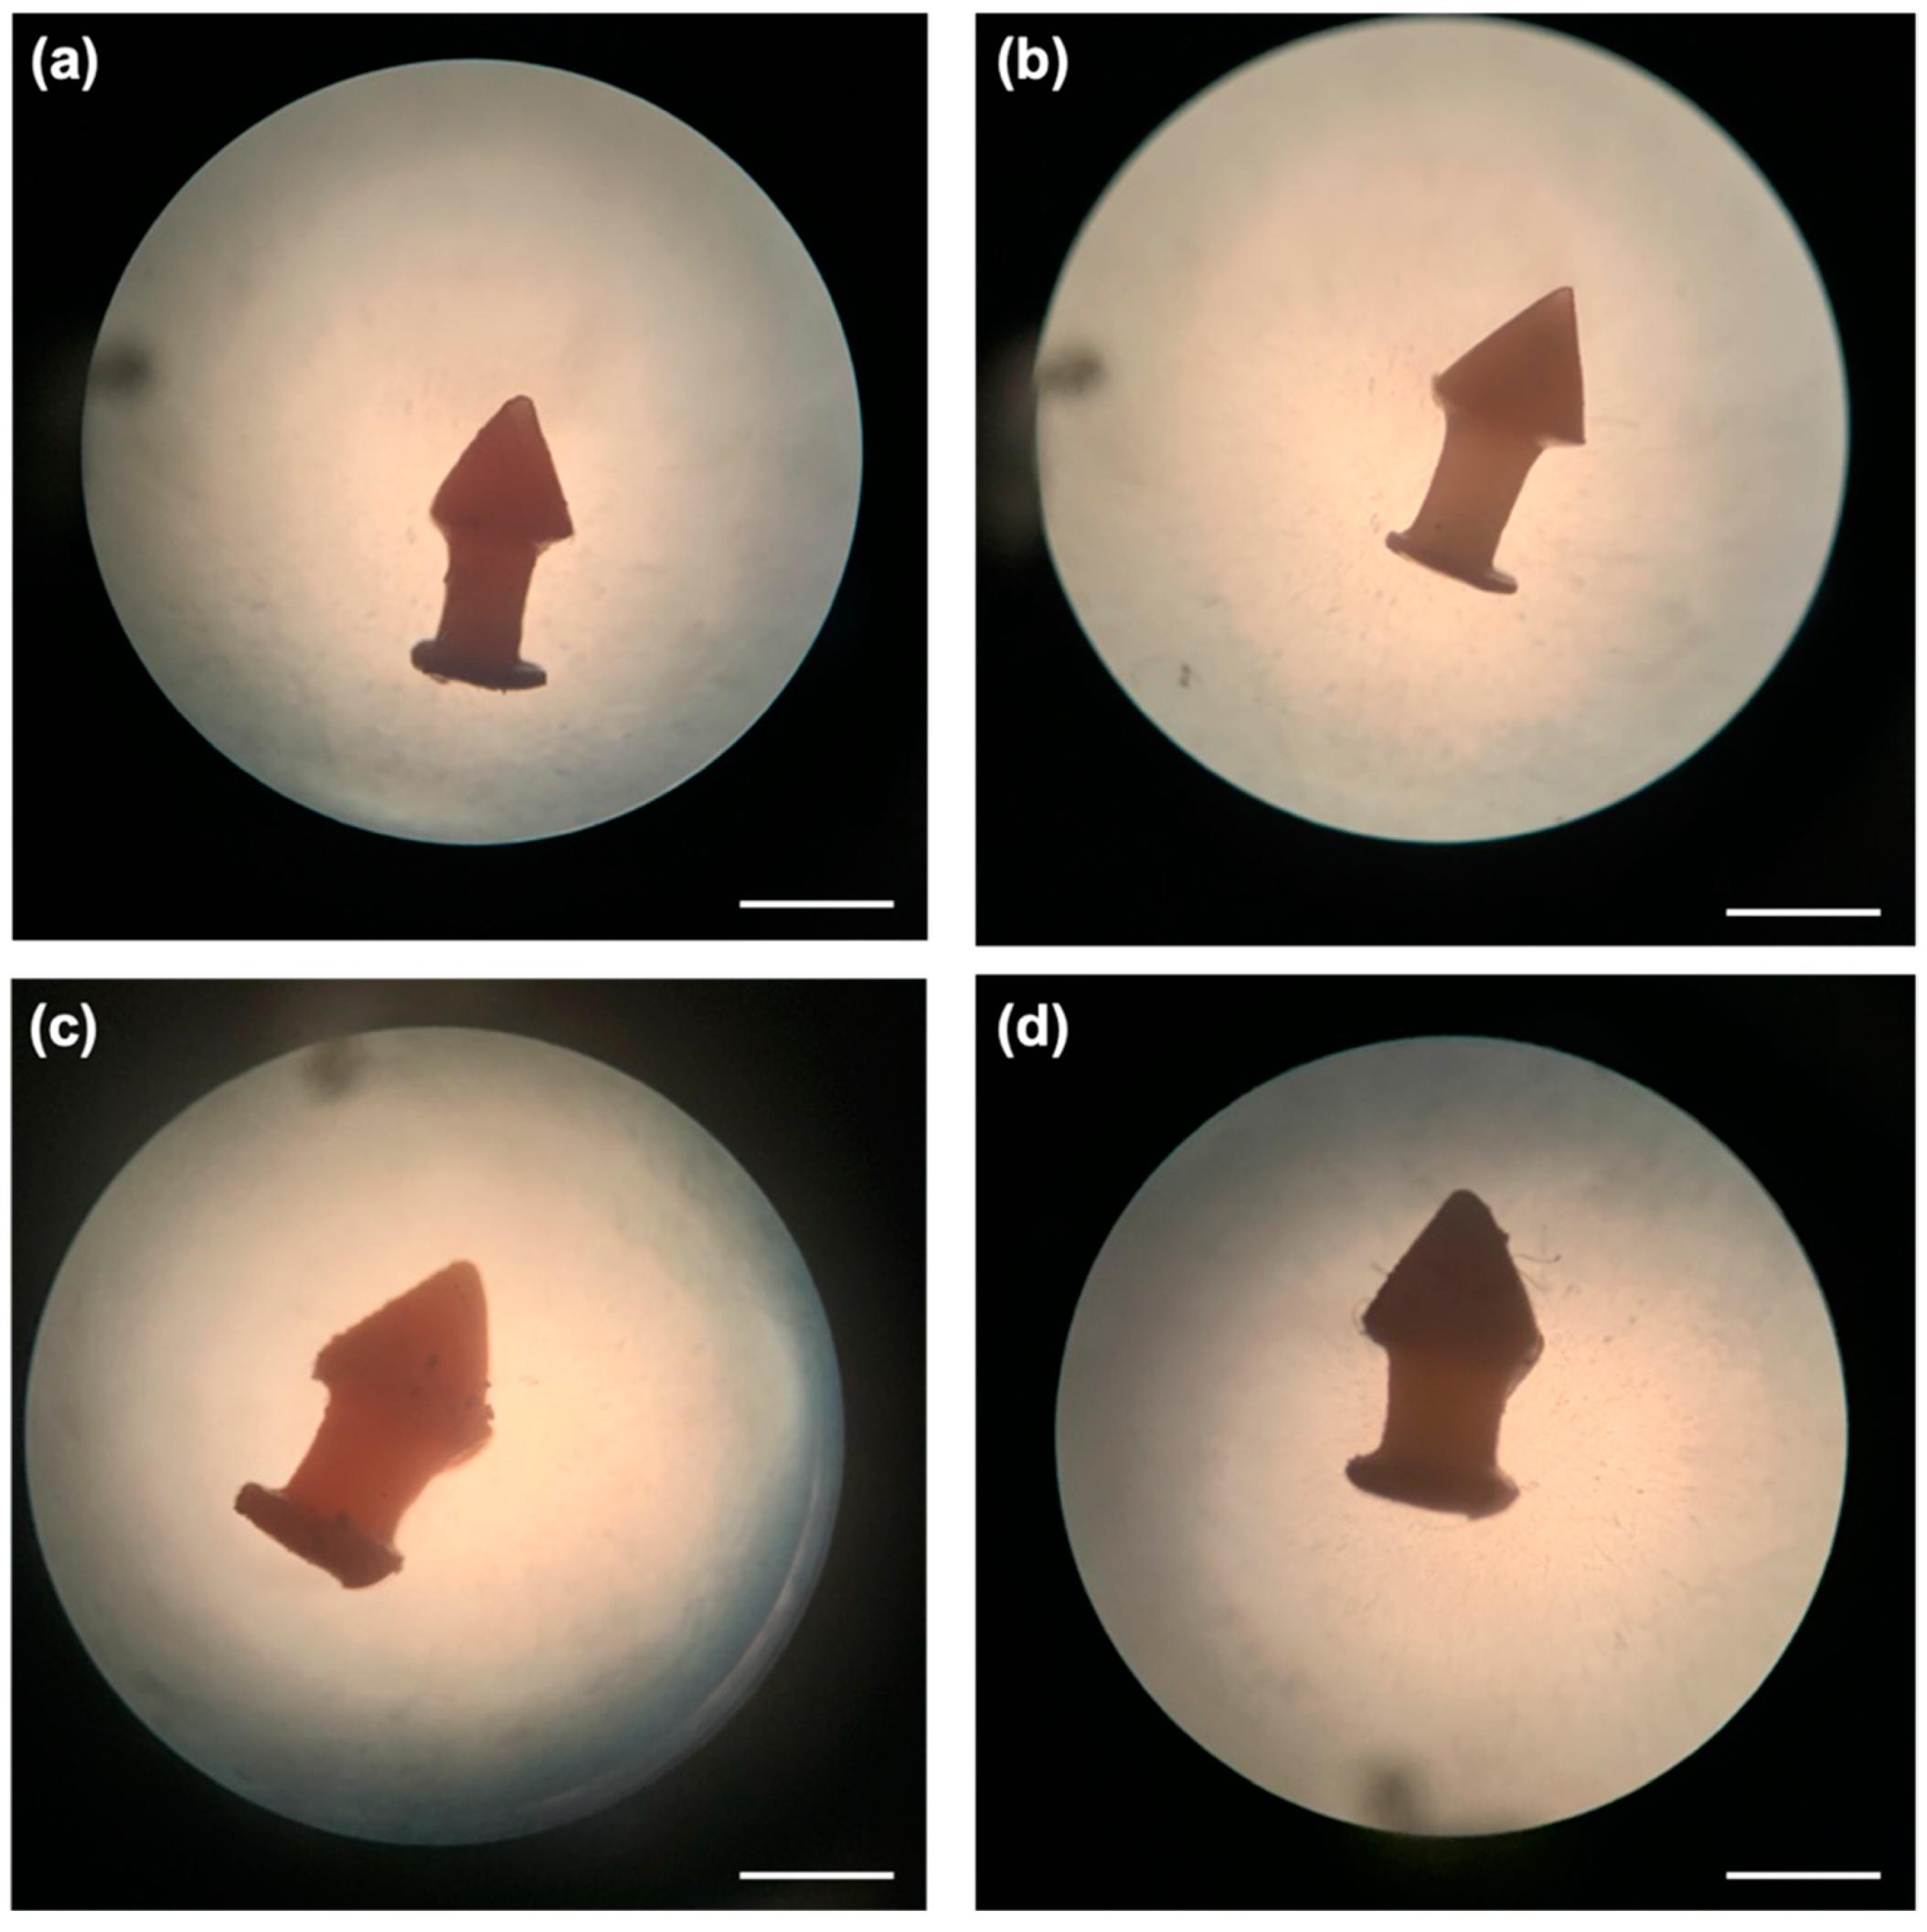 Light microscope images of the DLP 3D printed (a) D10, (b) D10PEG, (c) D20, and (d) D20PEG punctal plugs. Image via MDPI.